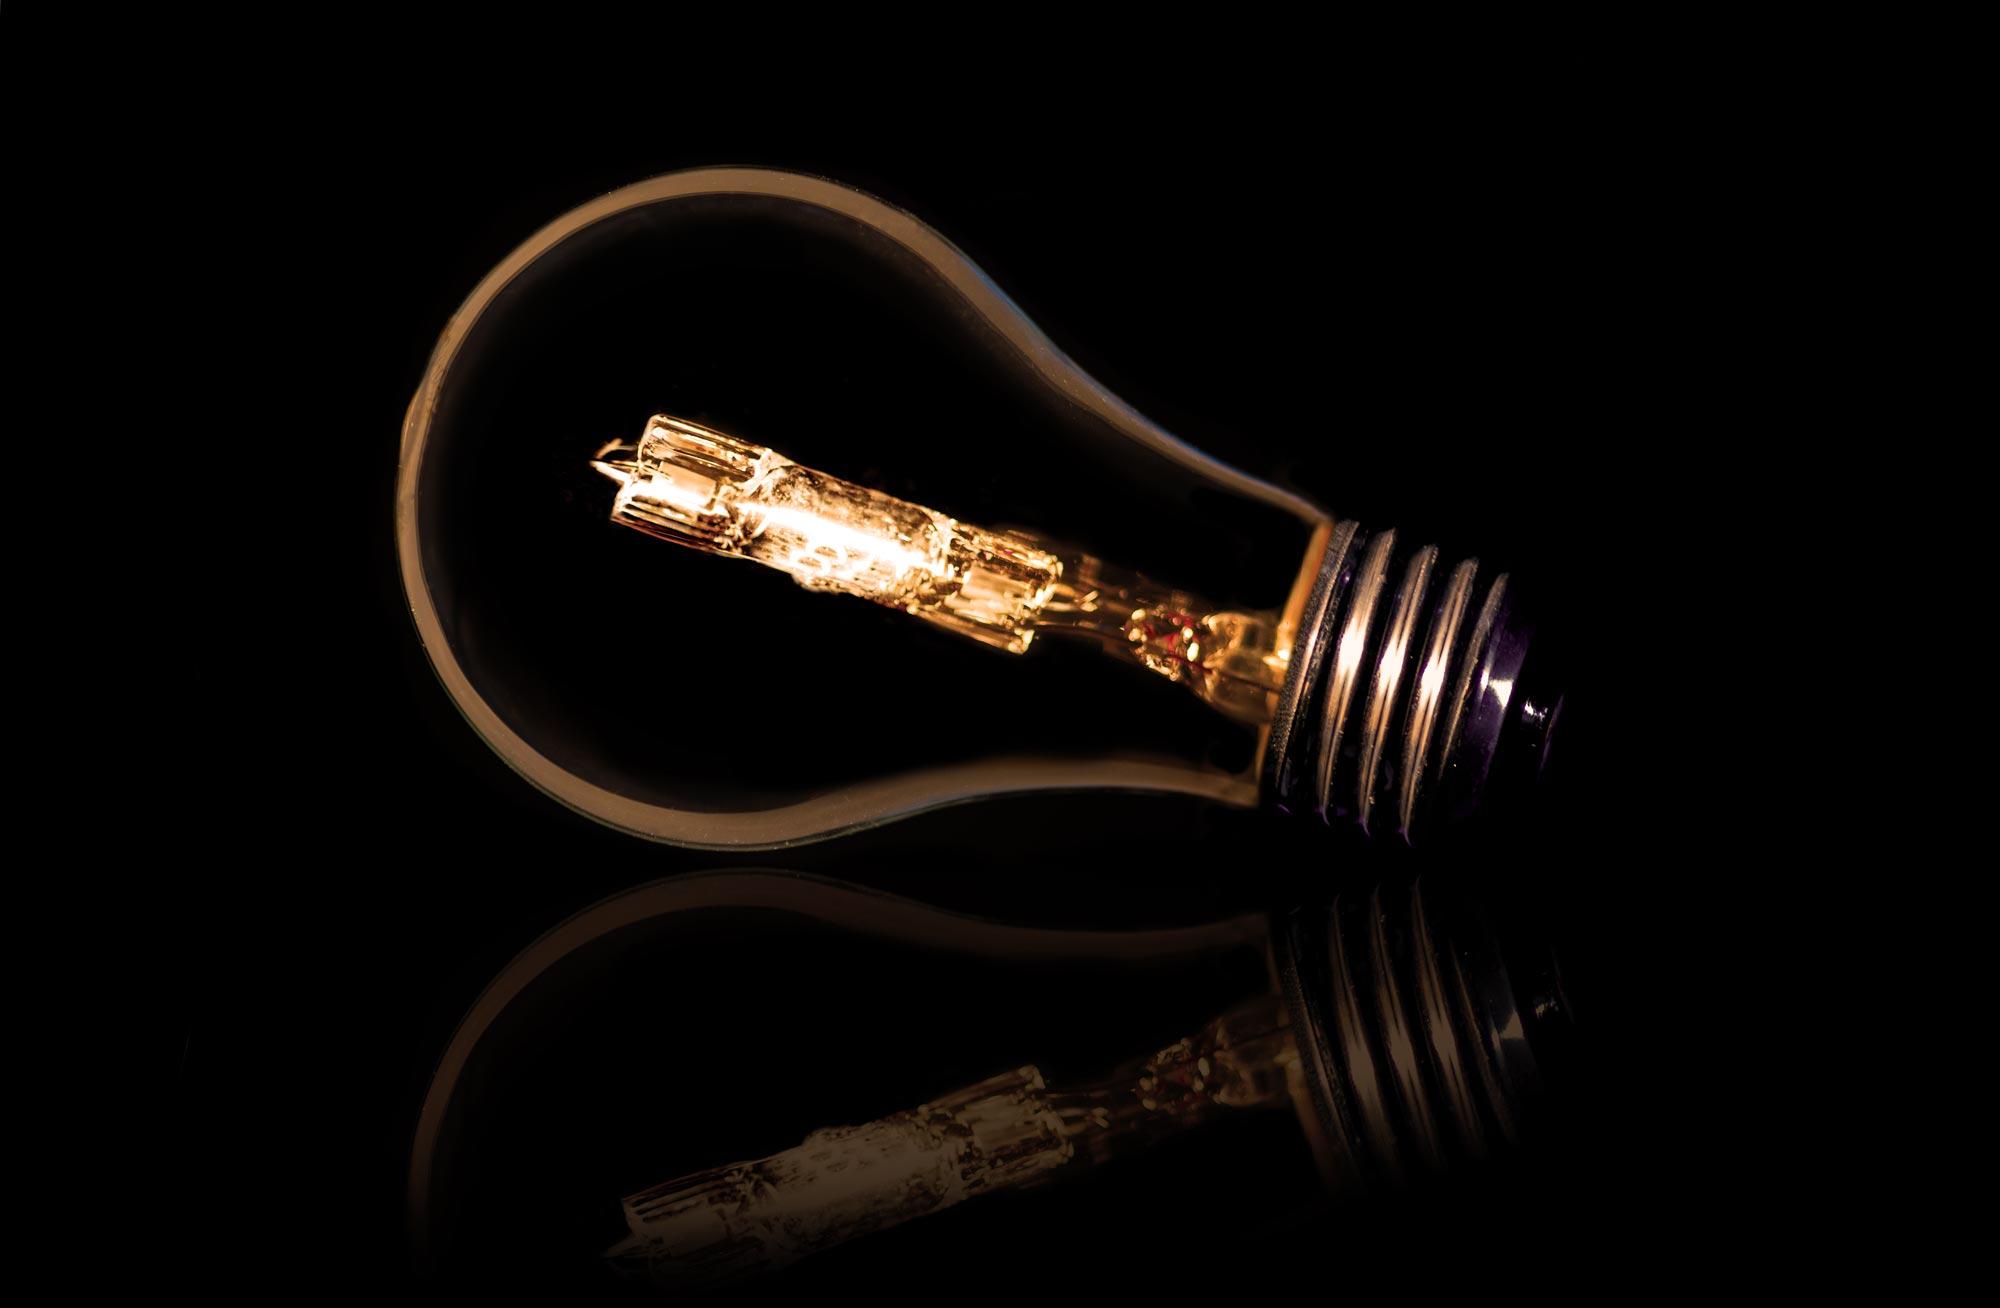 bulb great free stock search light dl photography bulbs srgb photo photos pexels idea cs